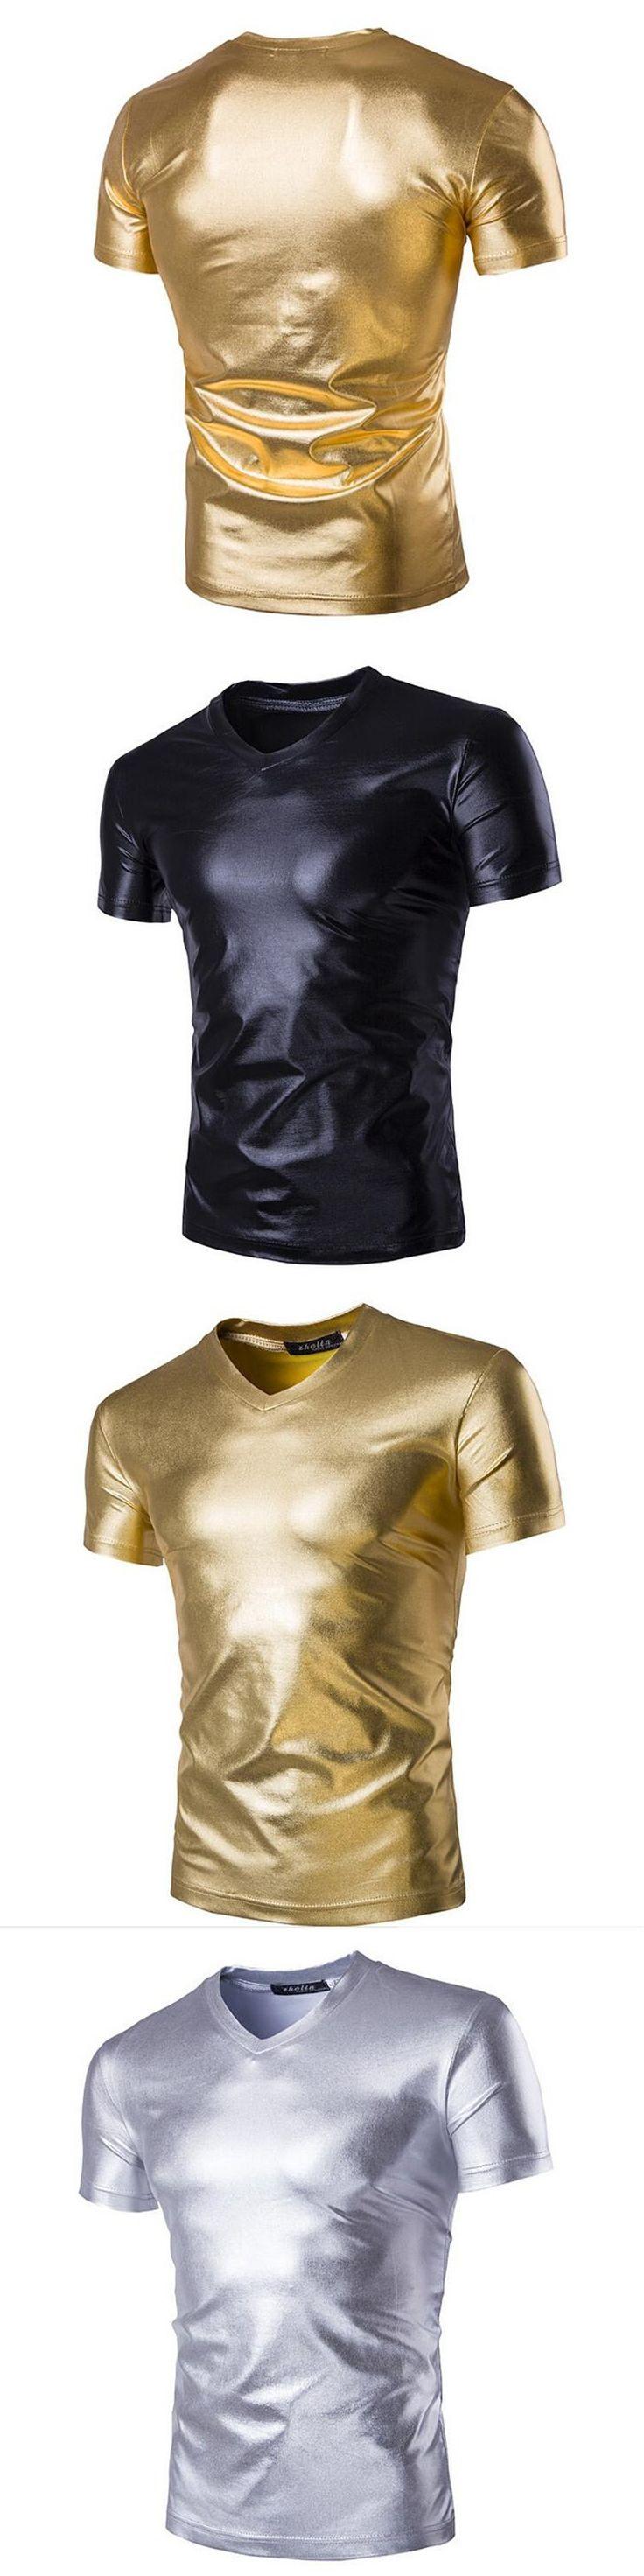 2017 Hot Sale Rushed Night Club Wear Mens Tee Shirts Coated Metallic Tshirts Summer Punk Style Shiny Short Sleeve T-shirt Men